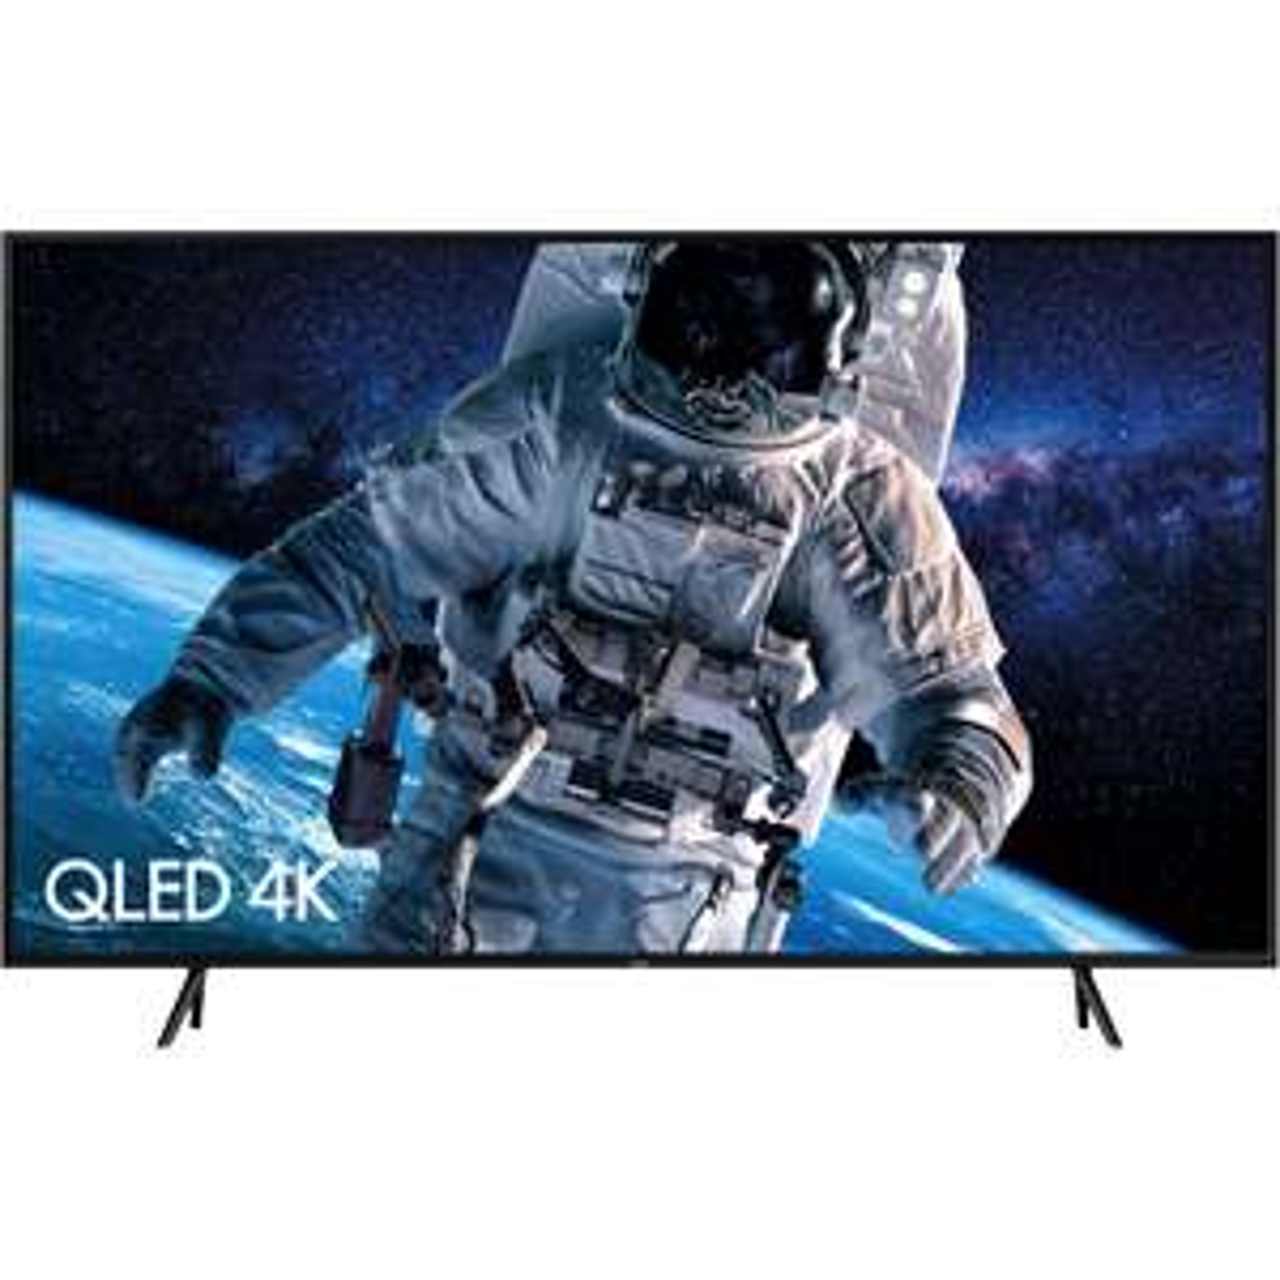 "Samsung QLED QE55Q60RA 55"" Smart HDR 4K Ultra HD TV, Quantum Processor 4K and Ambient Mode - £869 @ AO (£769 after cashback)"